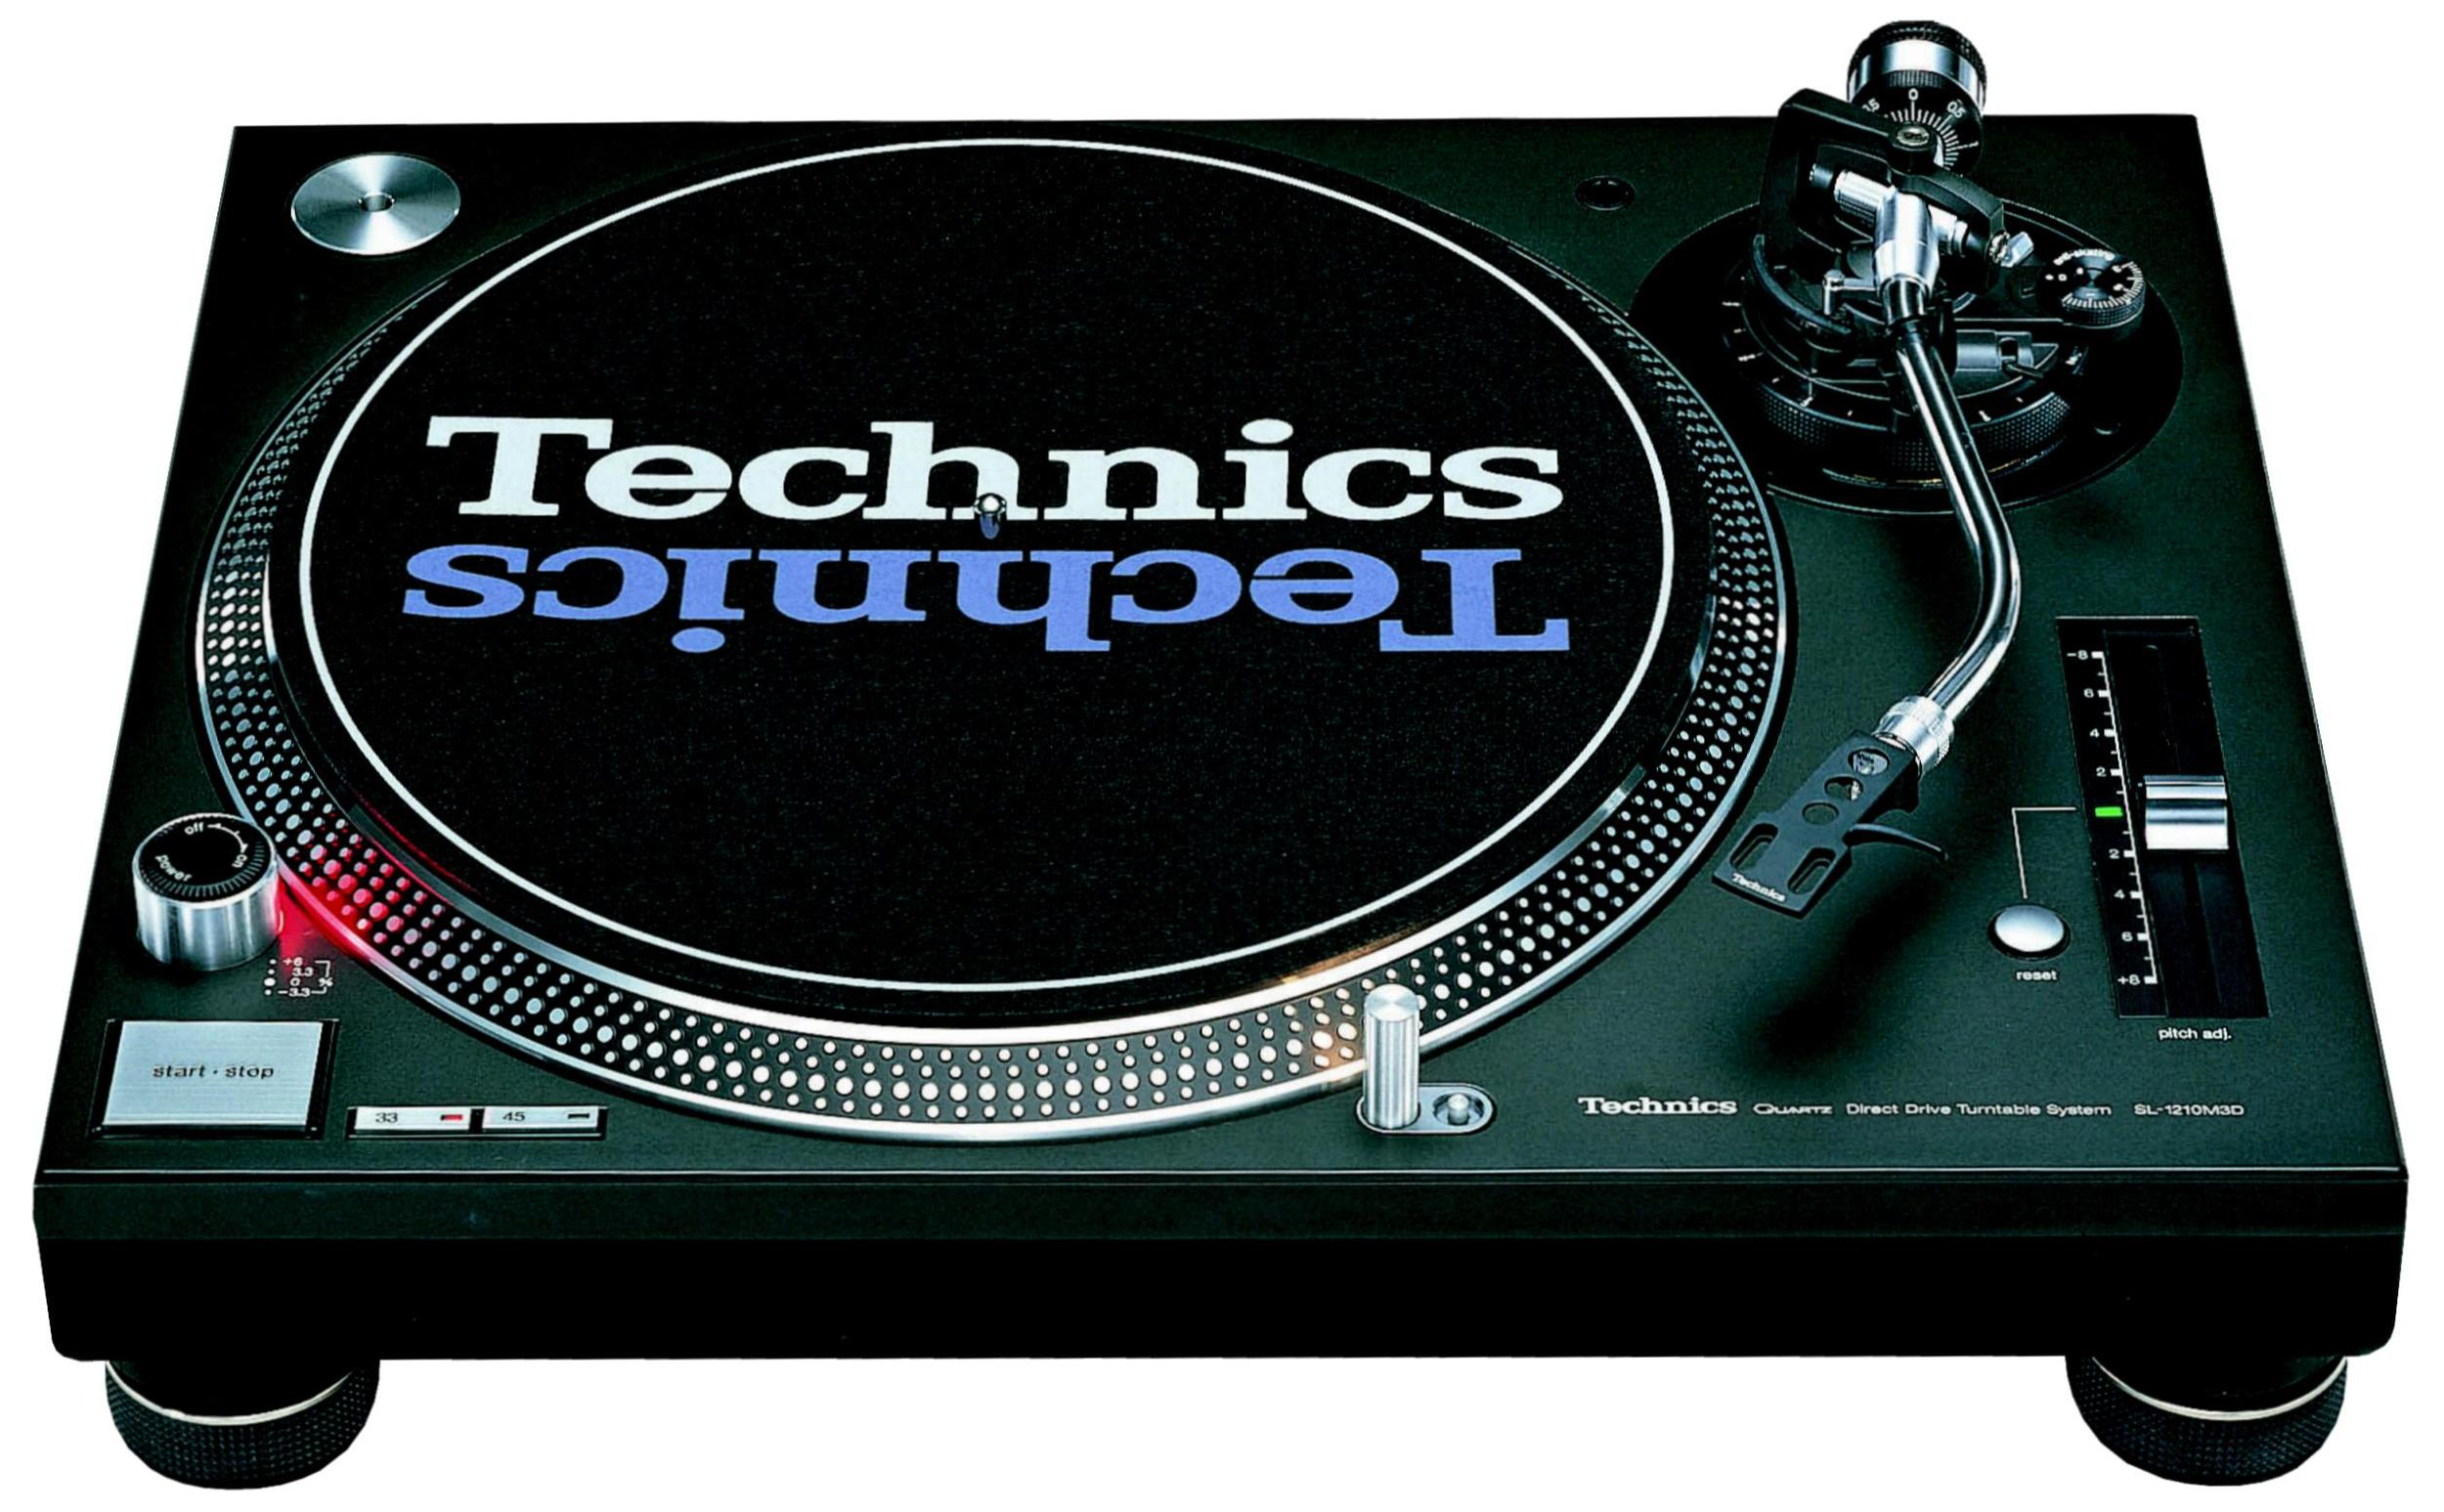 Technics SL-1210M3D (Late 90s model)